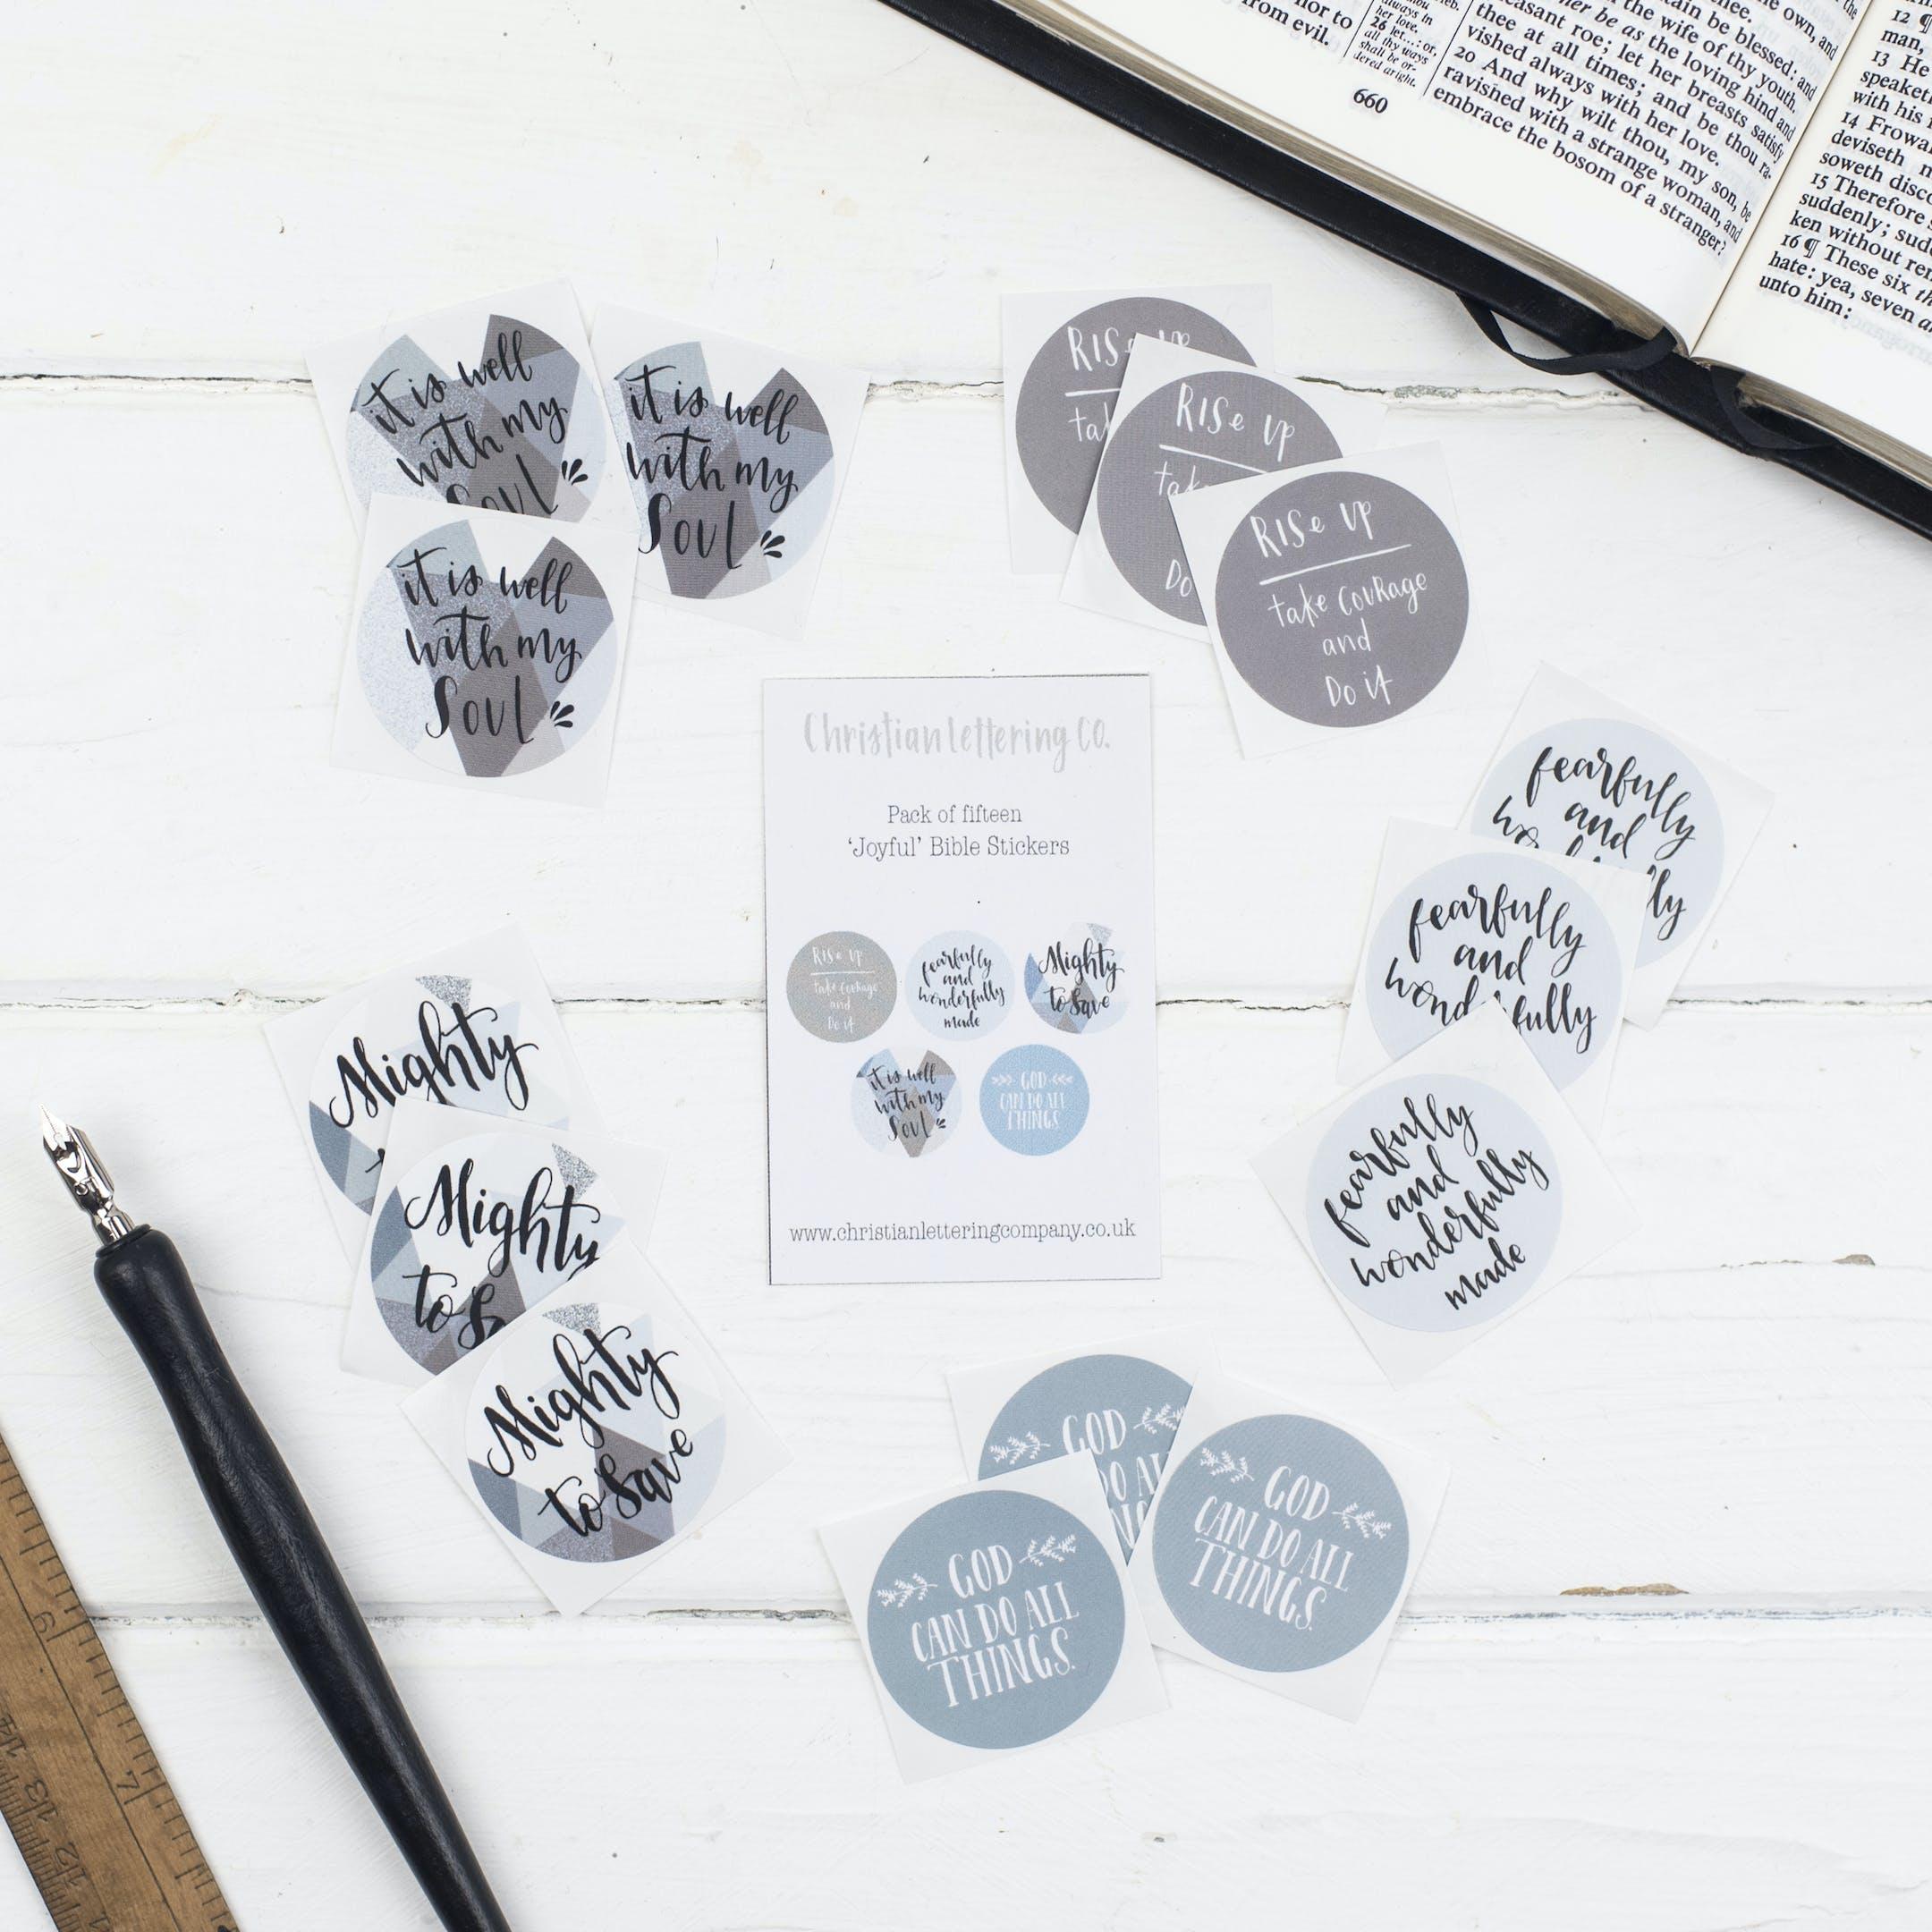 Bible Verse Stickers - Joyful Stickers - Christian Lettering Company